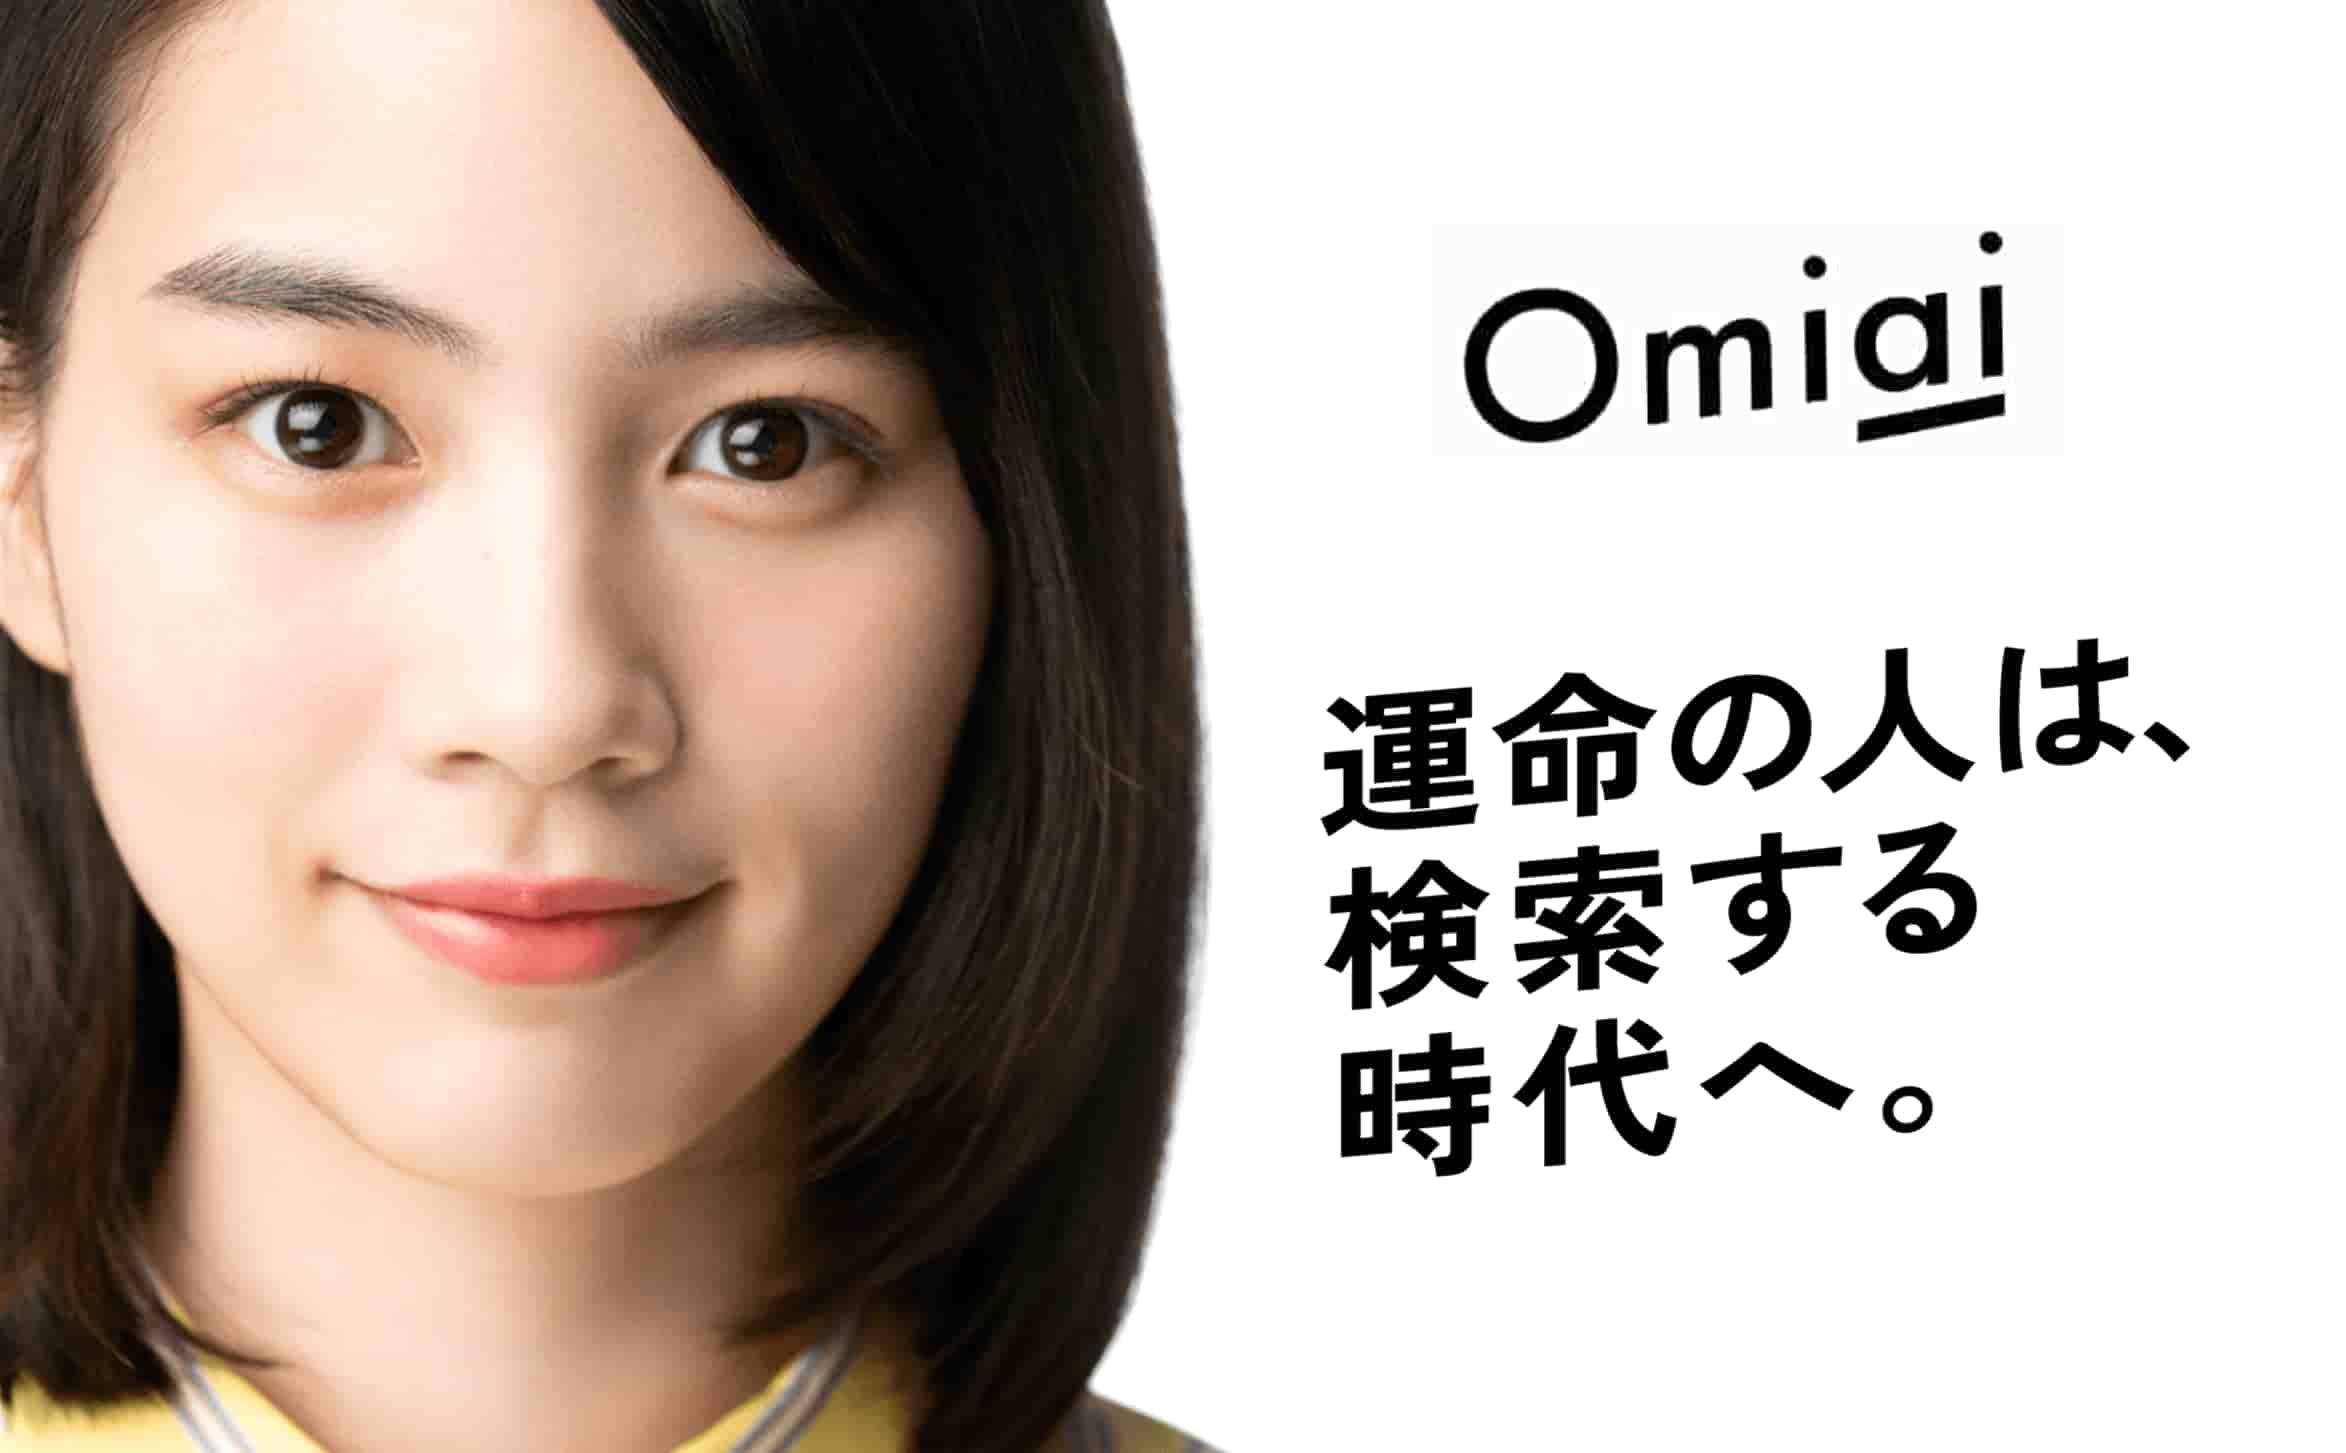 Omiaiの特徴を徹底解説